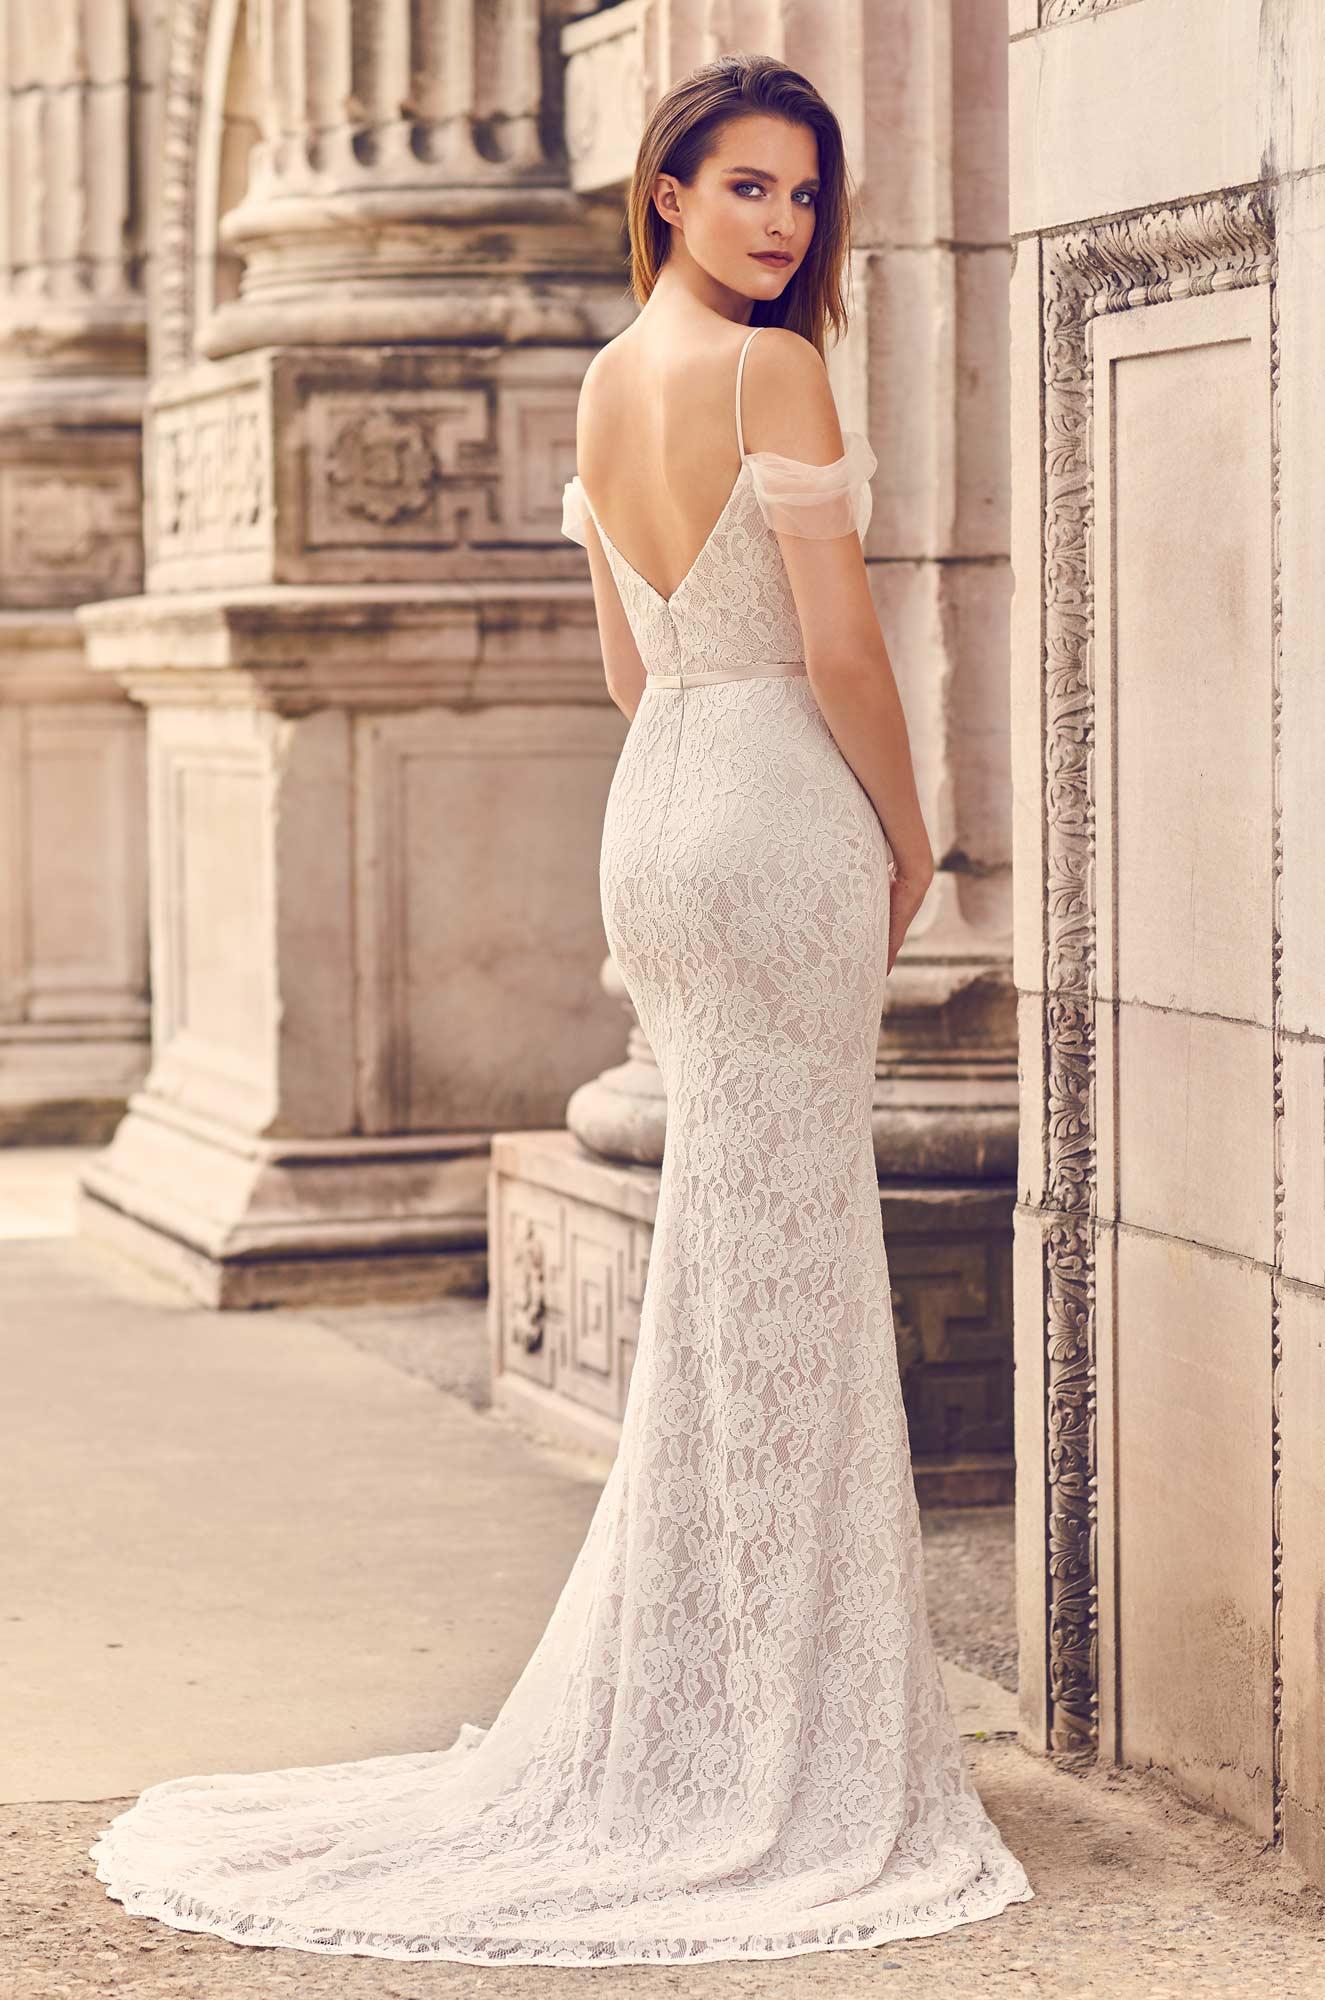 Draped Tulle Sleeve Wedding Dress - Style #2228 | Mikaella Bridal